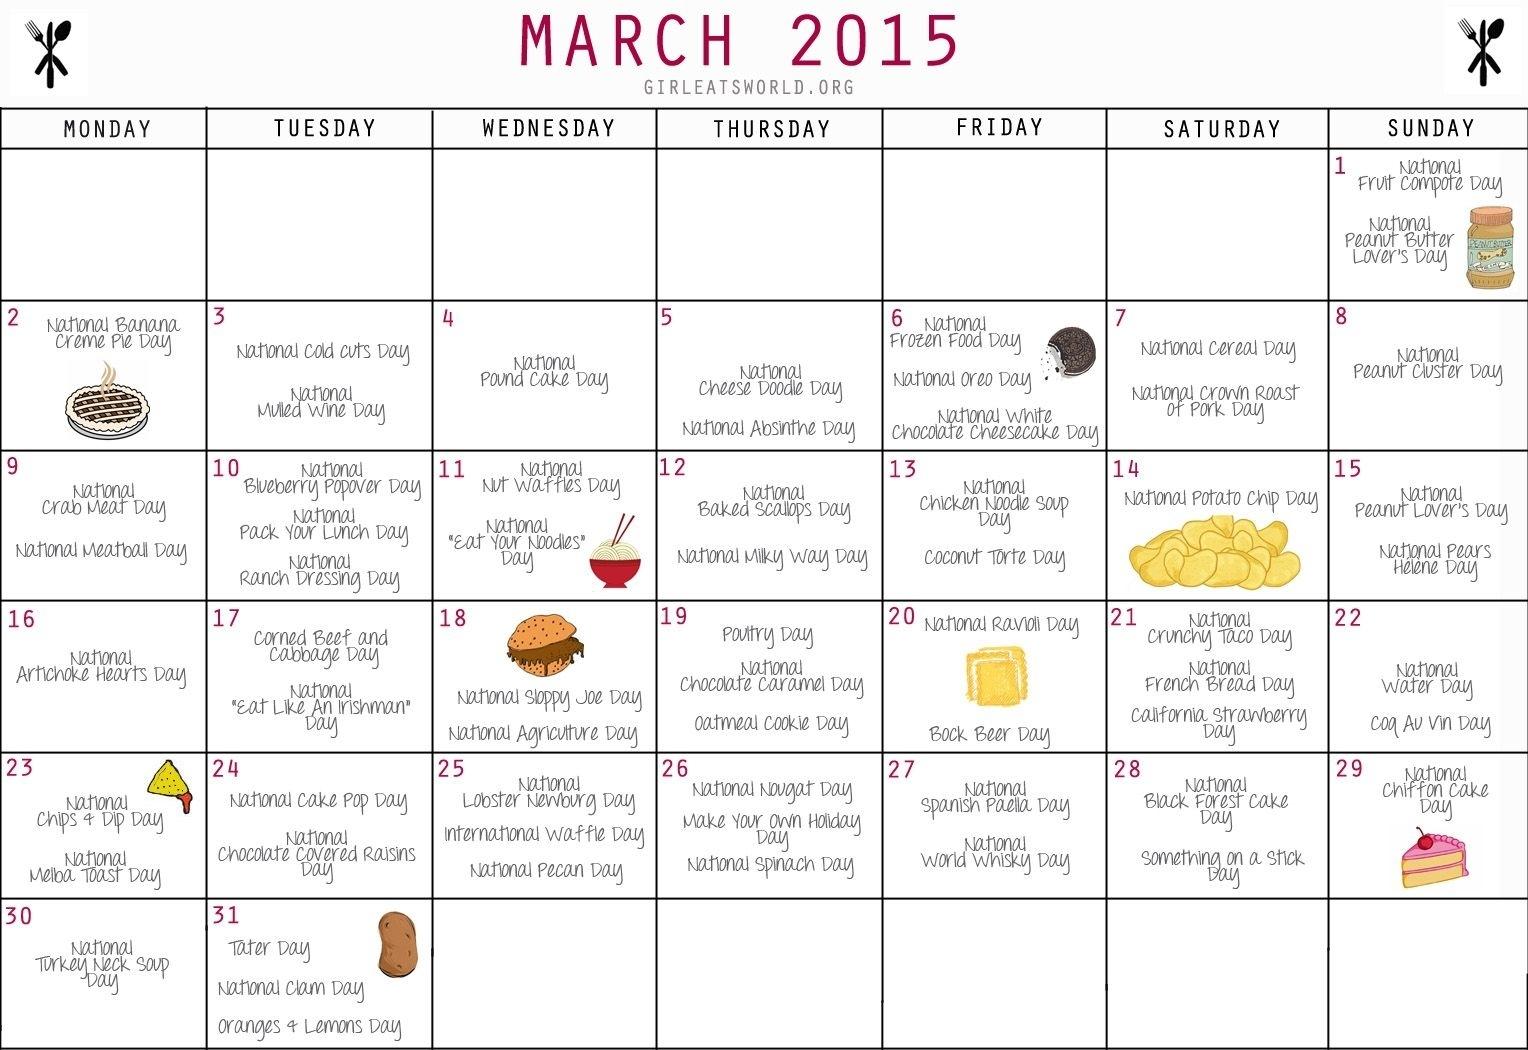 National Food Day Calendar Printable Printable Calendar 2018 pertaining to Free Printable National Food Days Of The Year Calendar